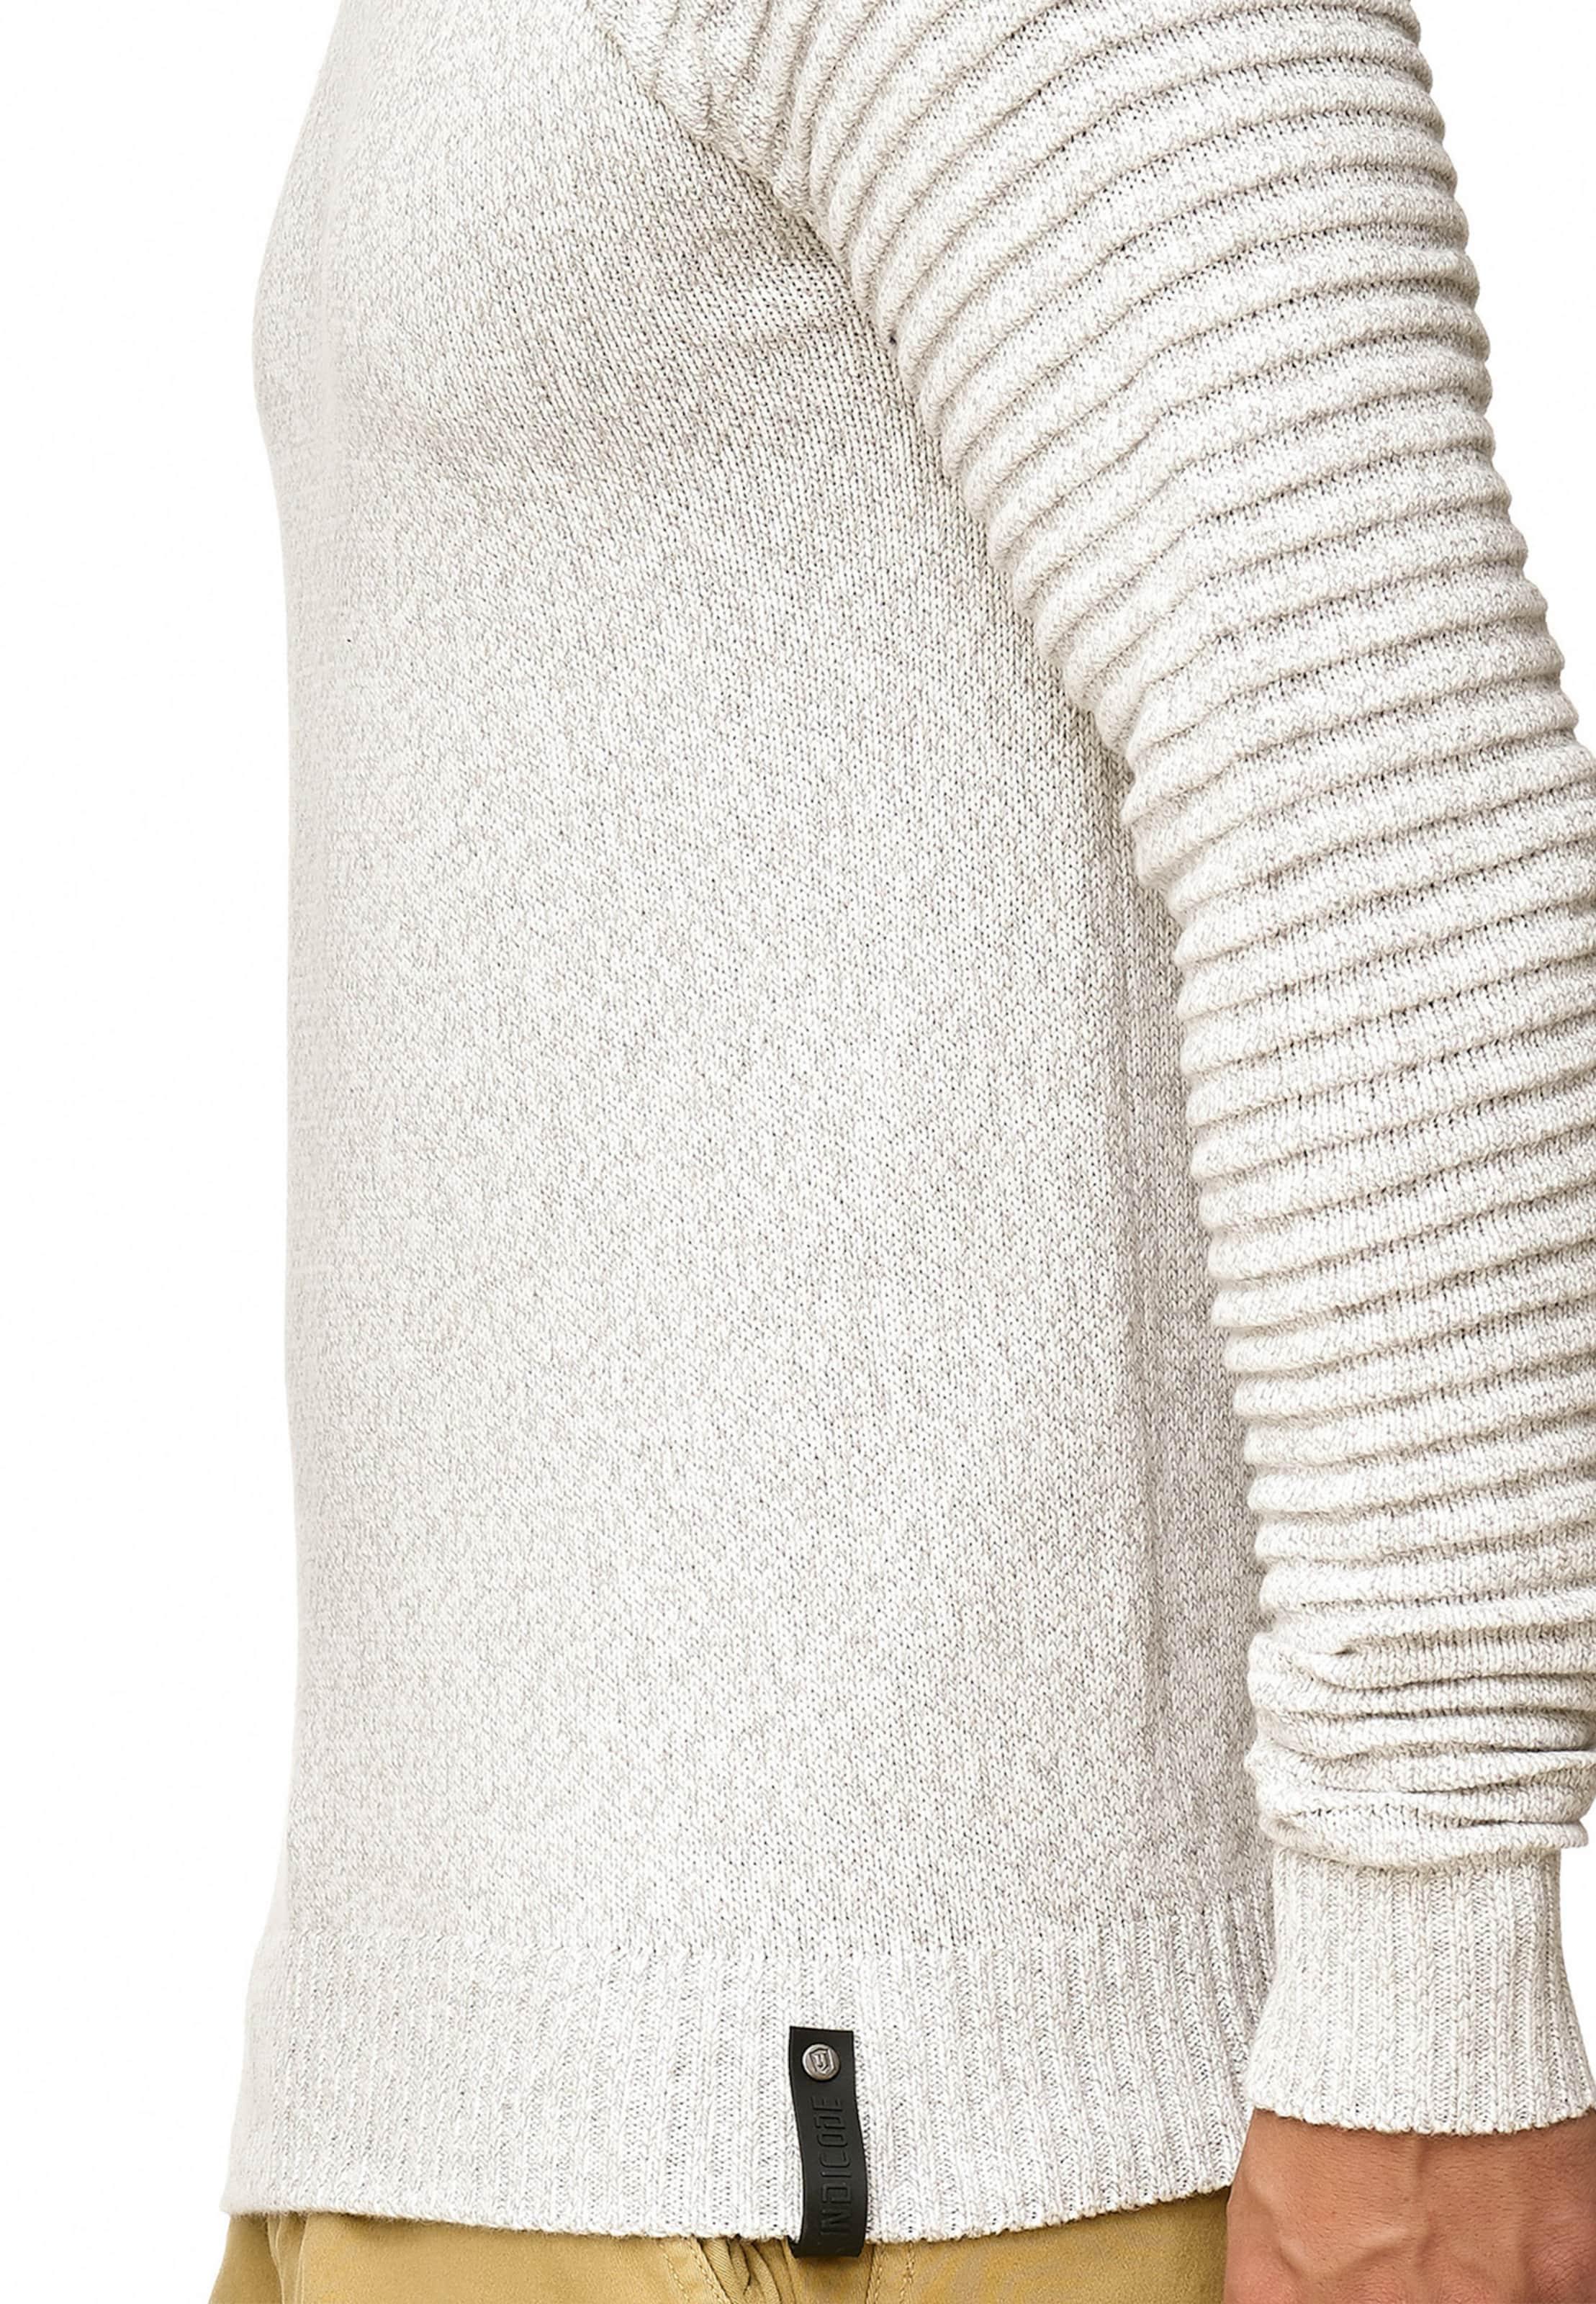 over 'maxime' Indicode Pull En Cassé Jeans Blanc 6ybf7g